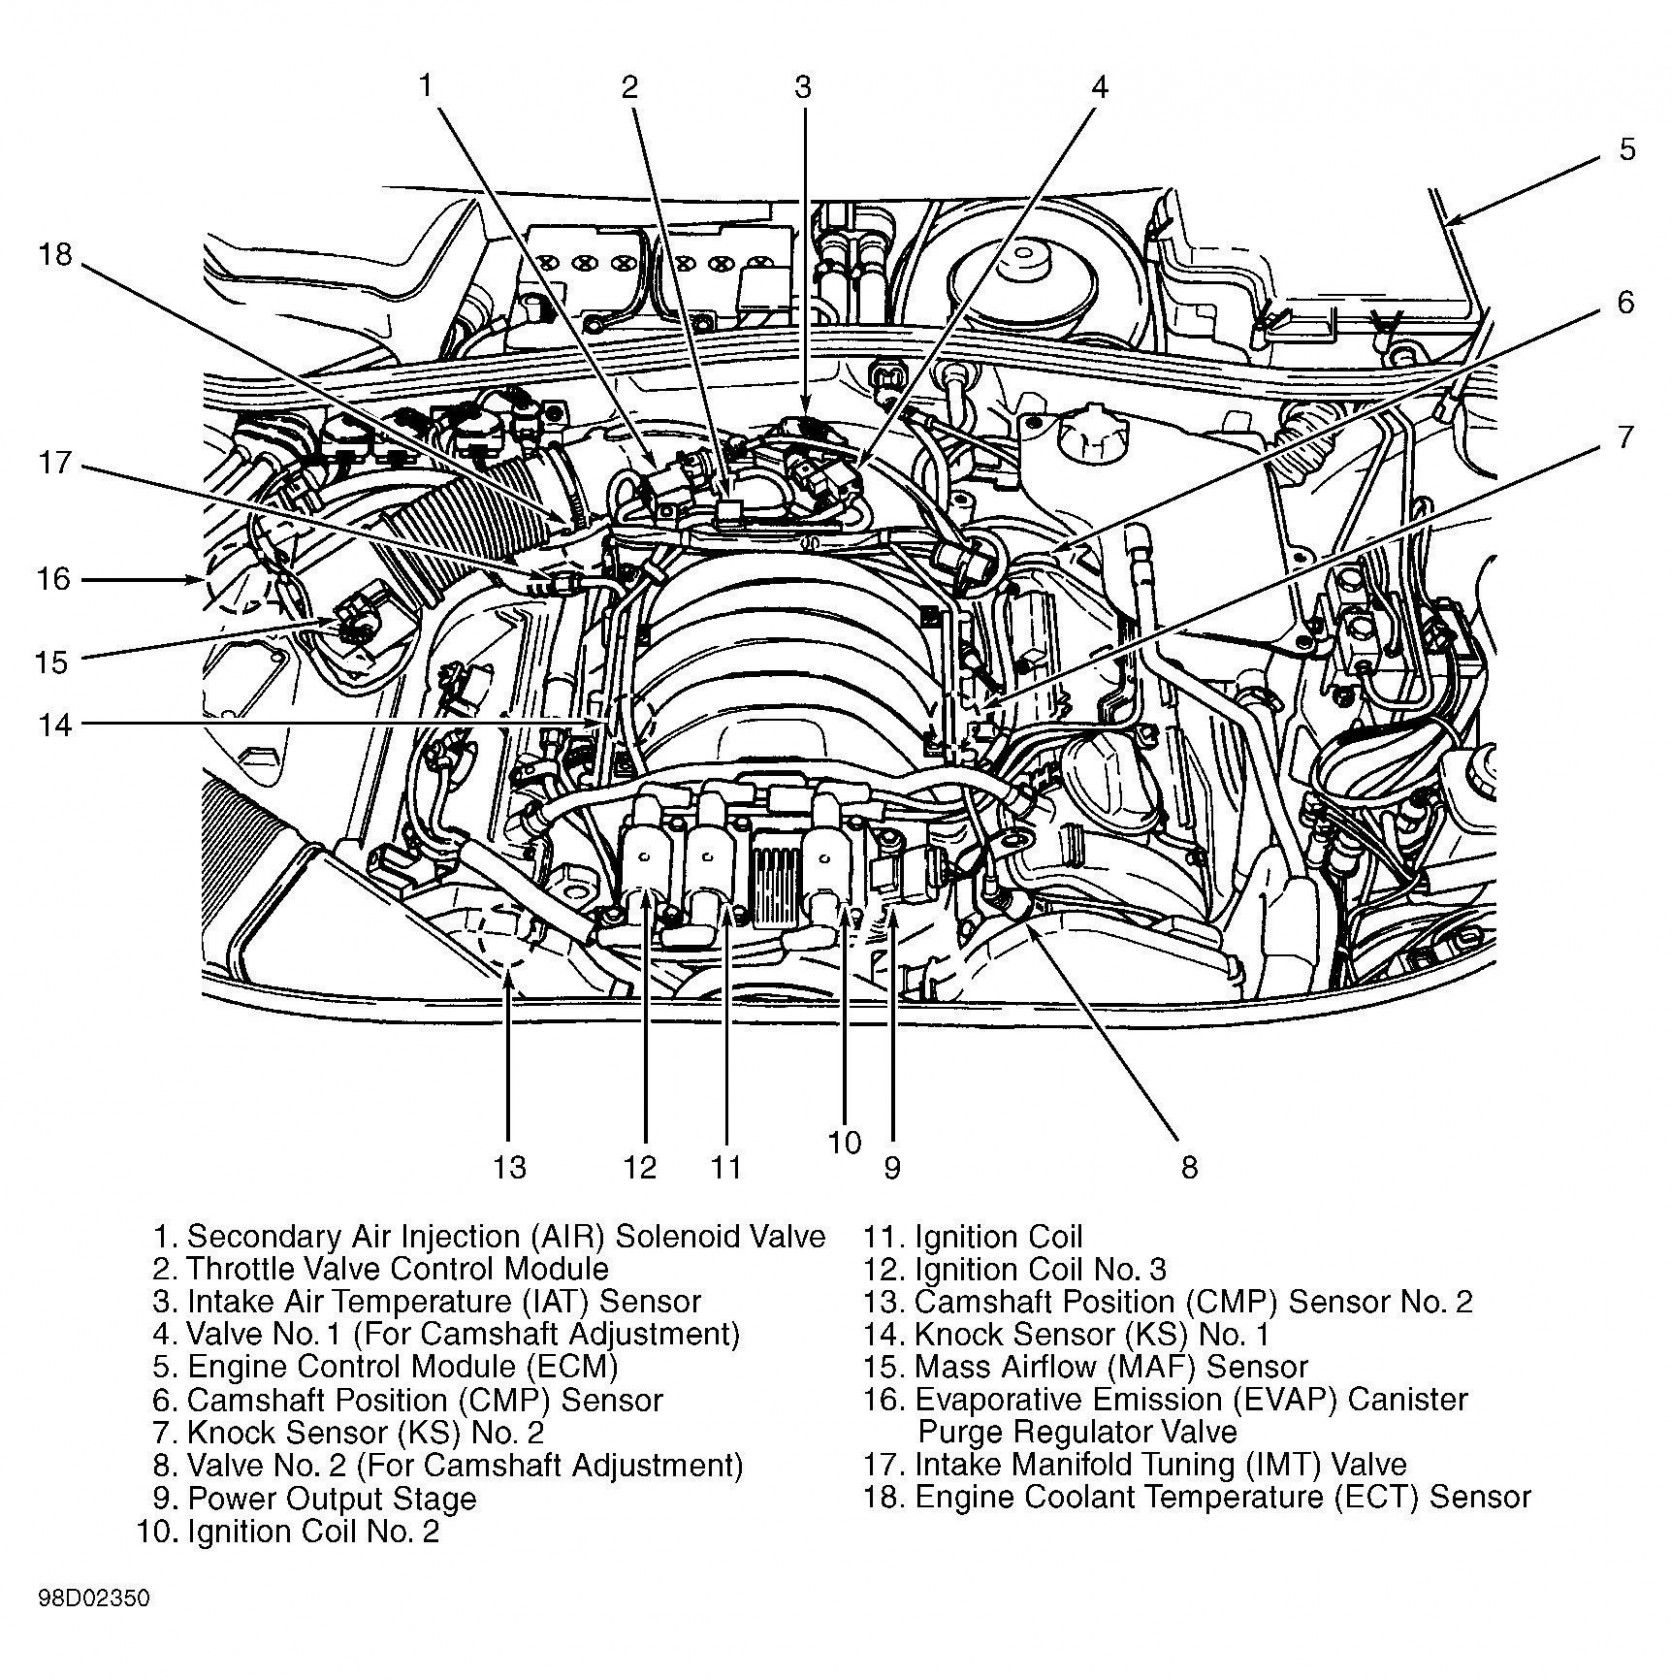 Vr6 Engine Diagram Knock Sensor